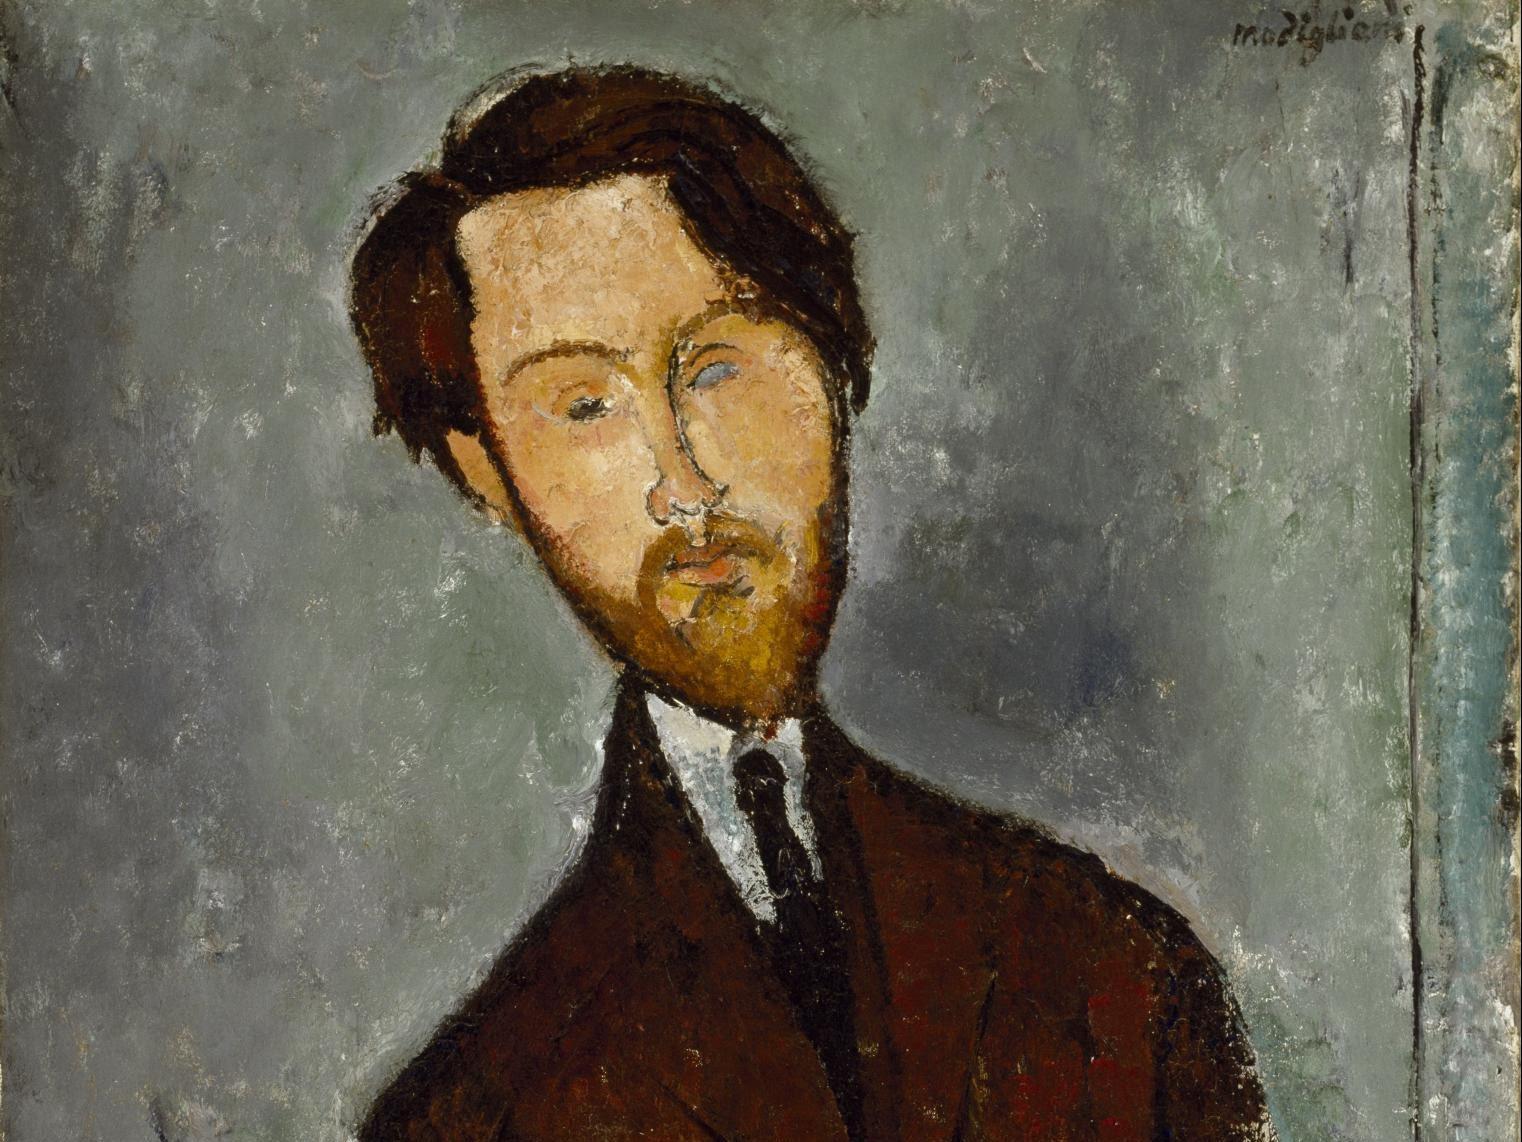 Amedeo_Modigliani_-_Léopold_Zborowski_-_Google_Art_Project